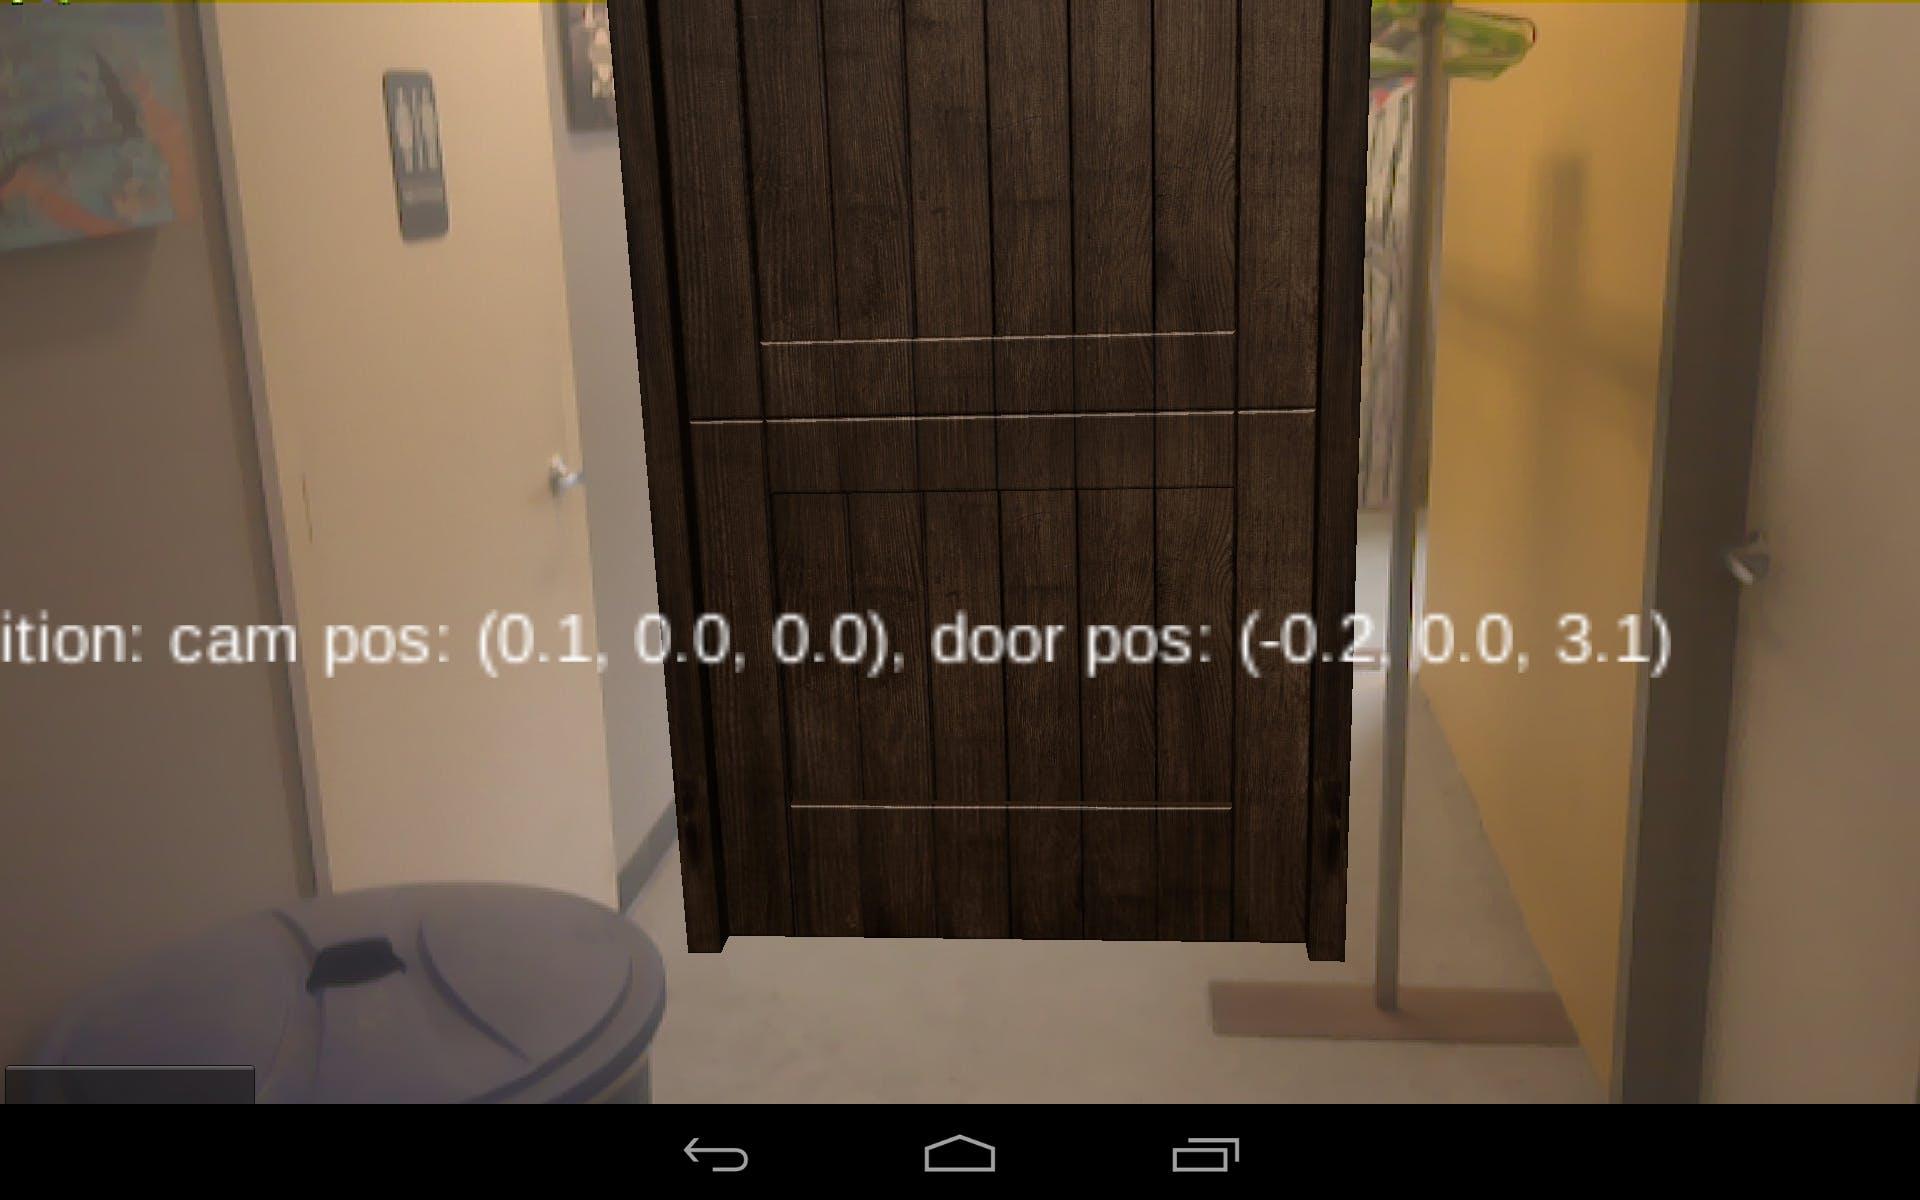 Augmented reality scene after placing door.